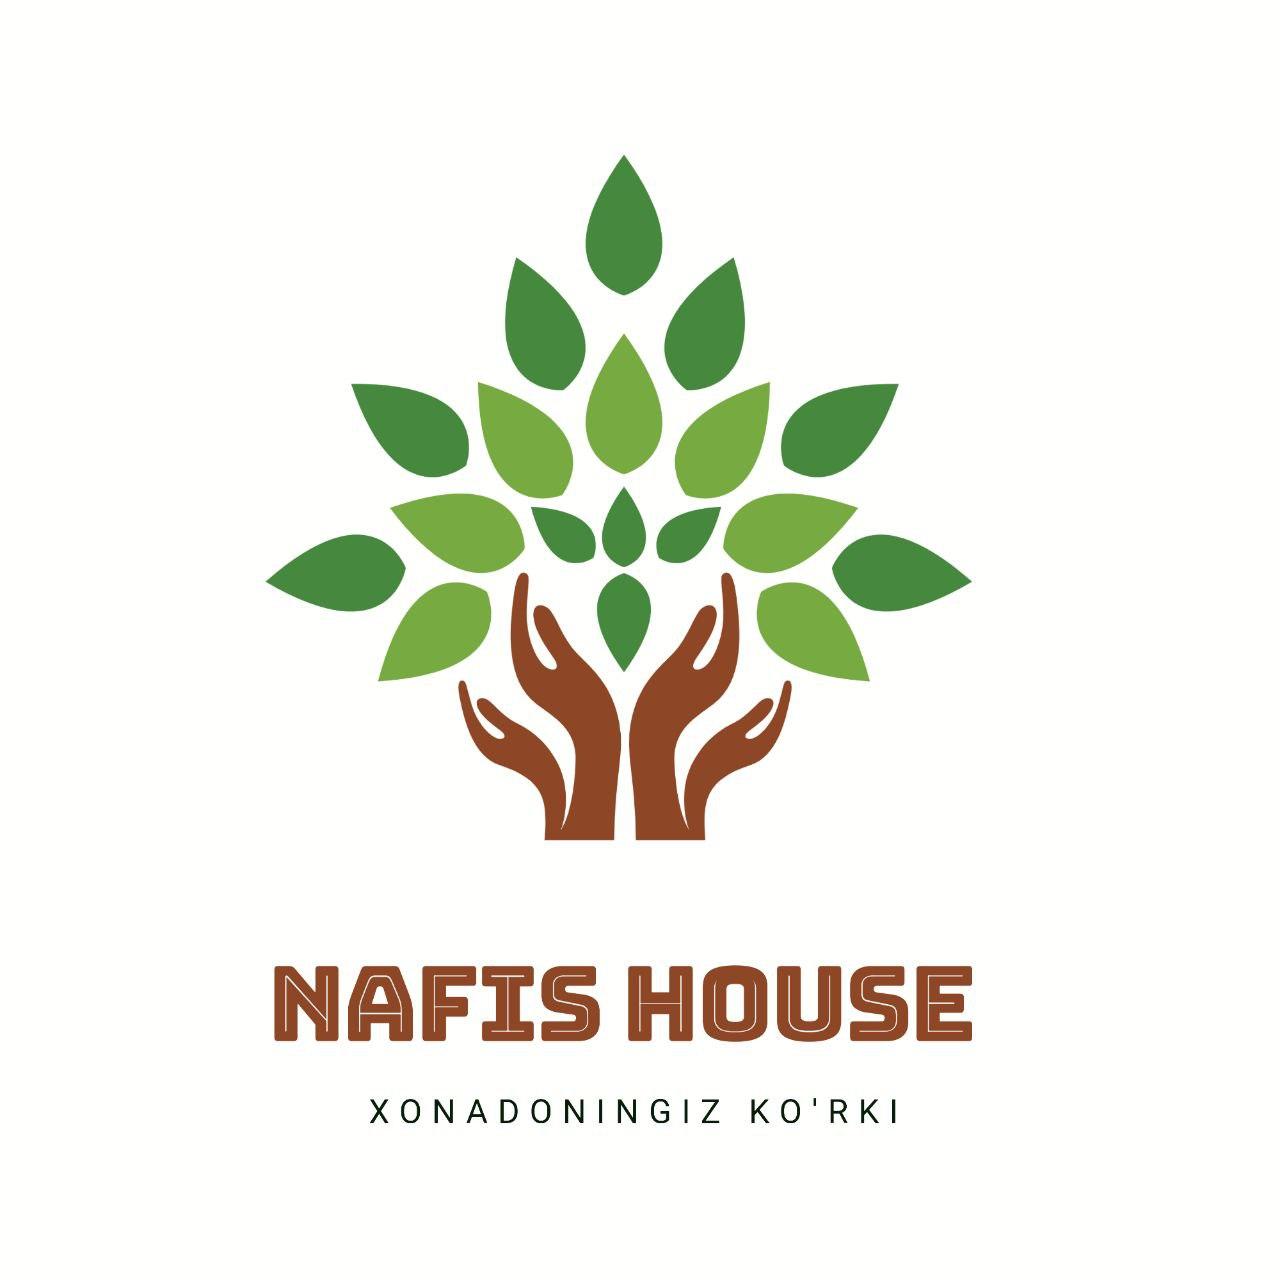 NAFIS HOUSE